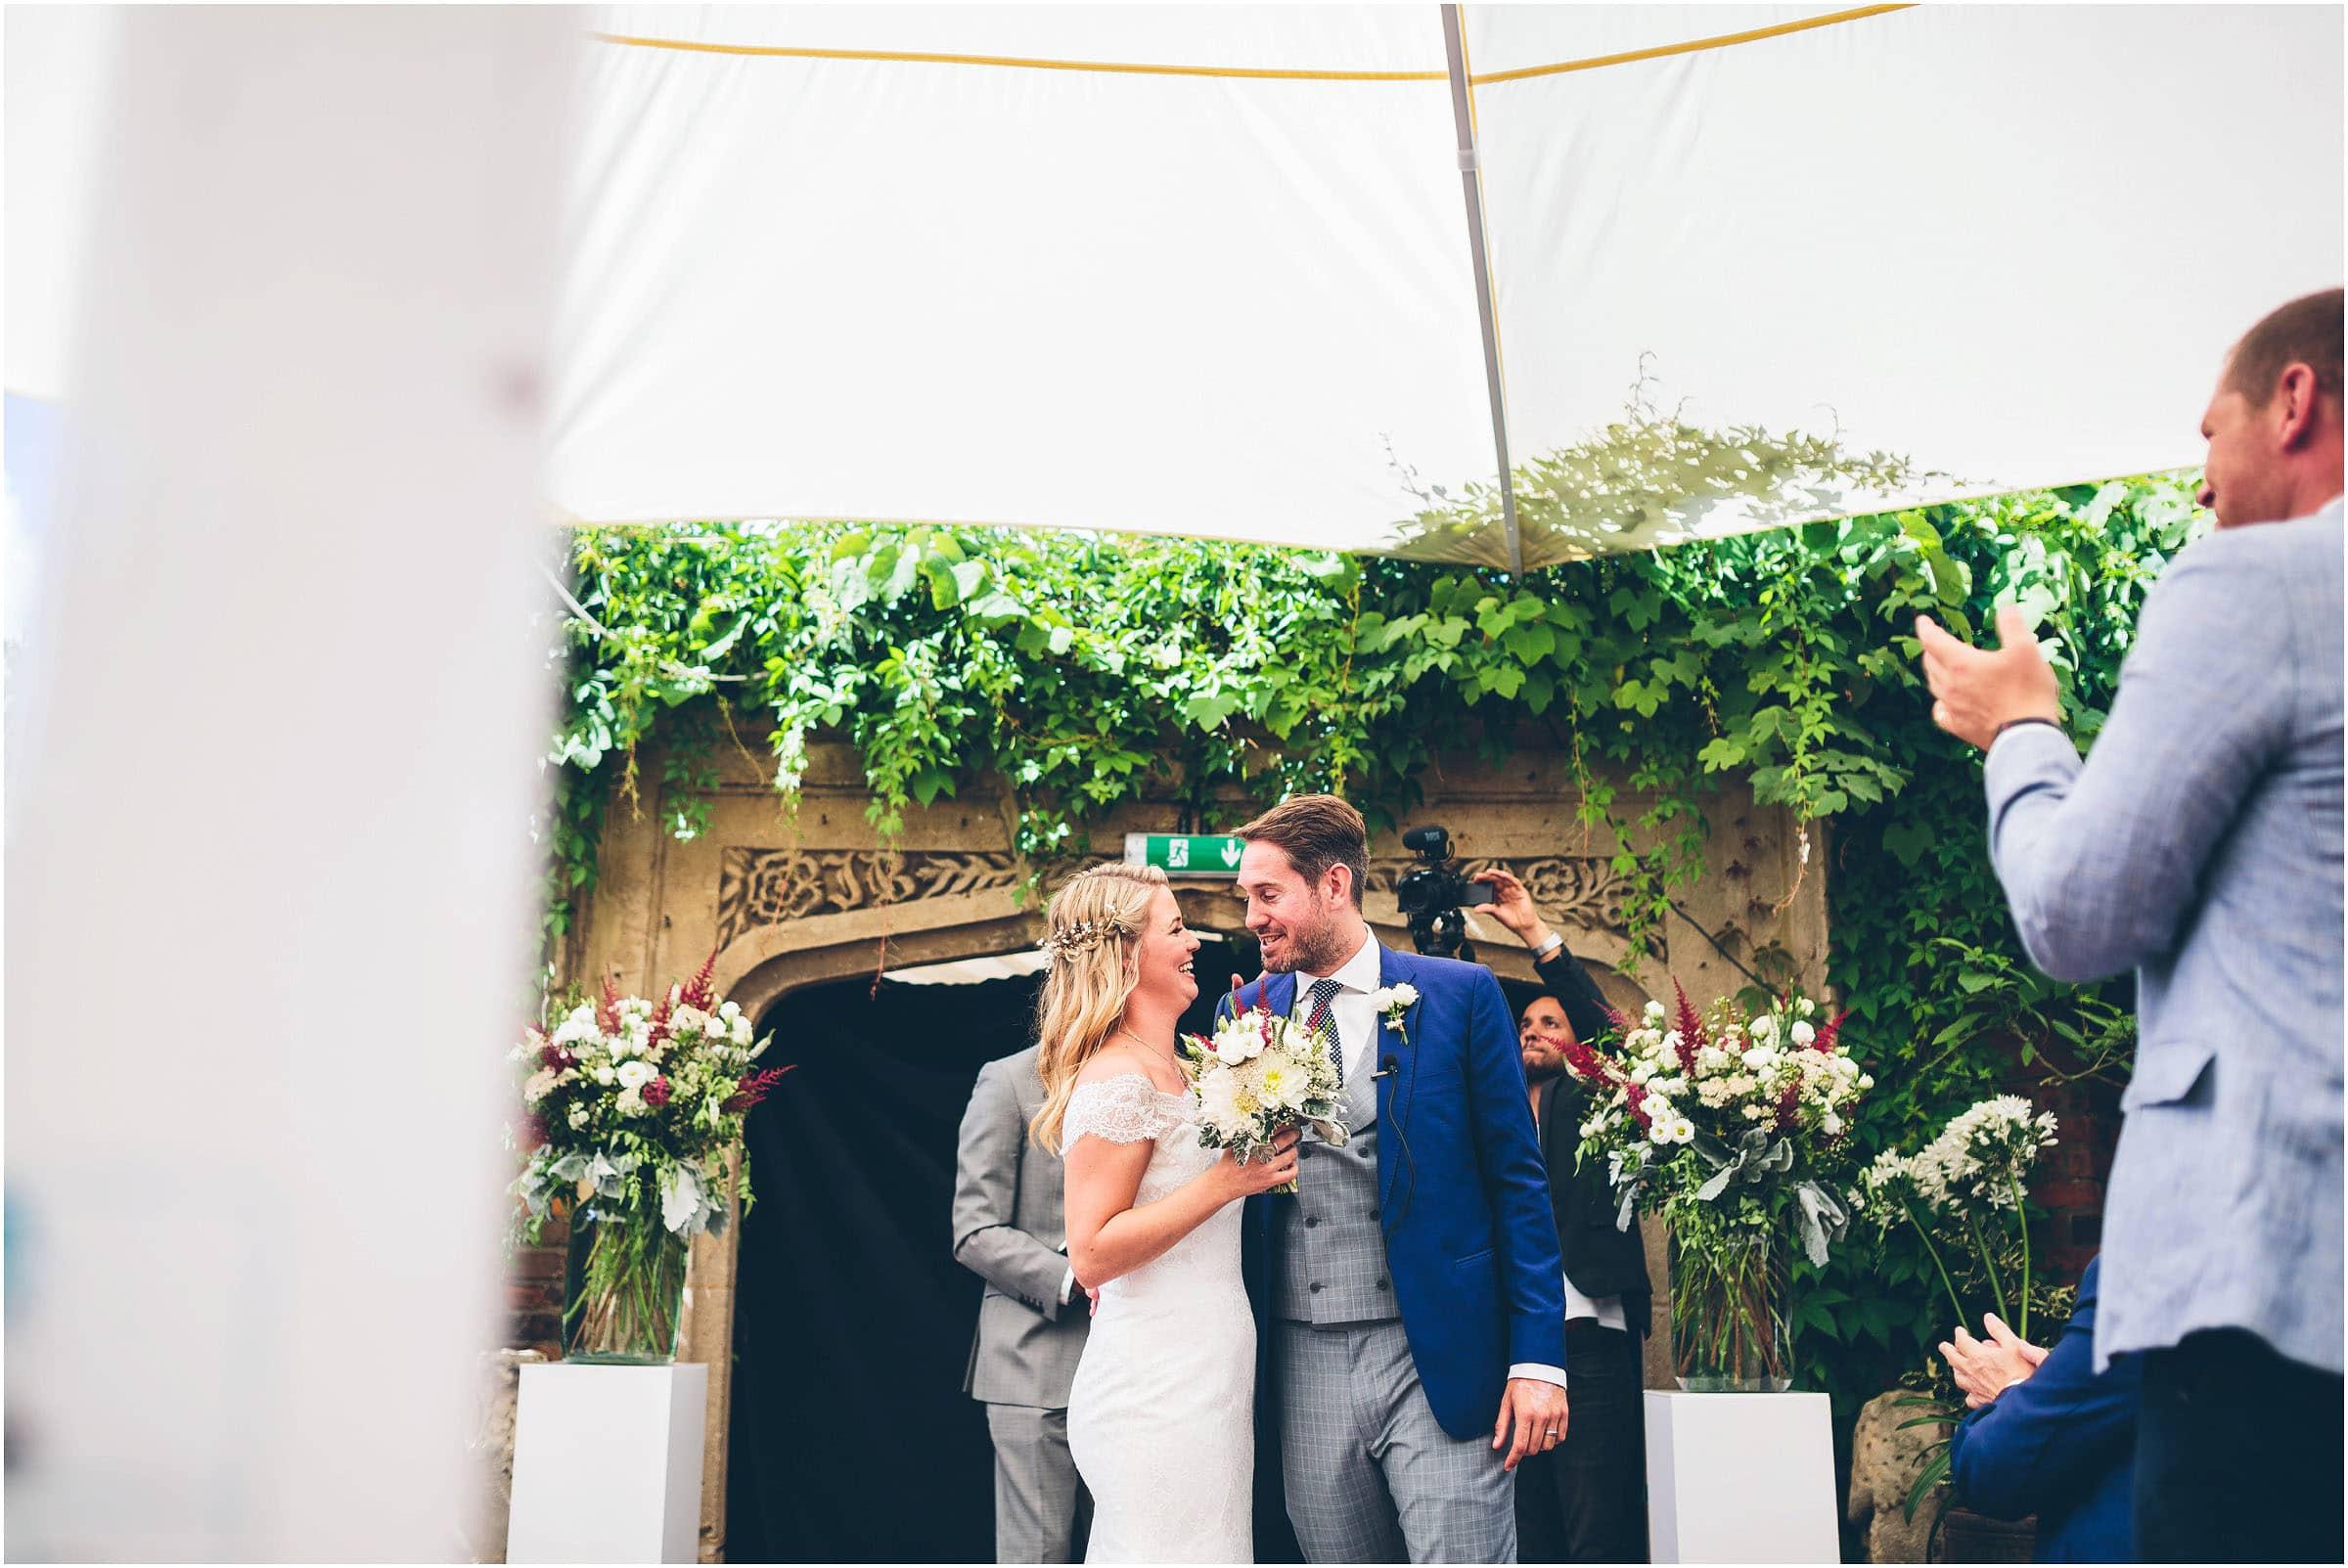 Kensington_Roof_Gardens_Wedding_Photography_0040